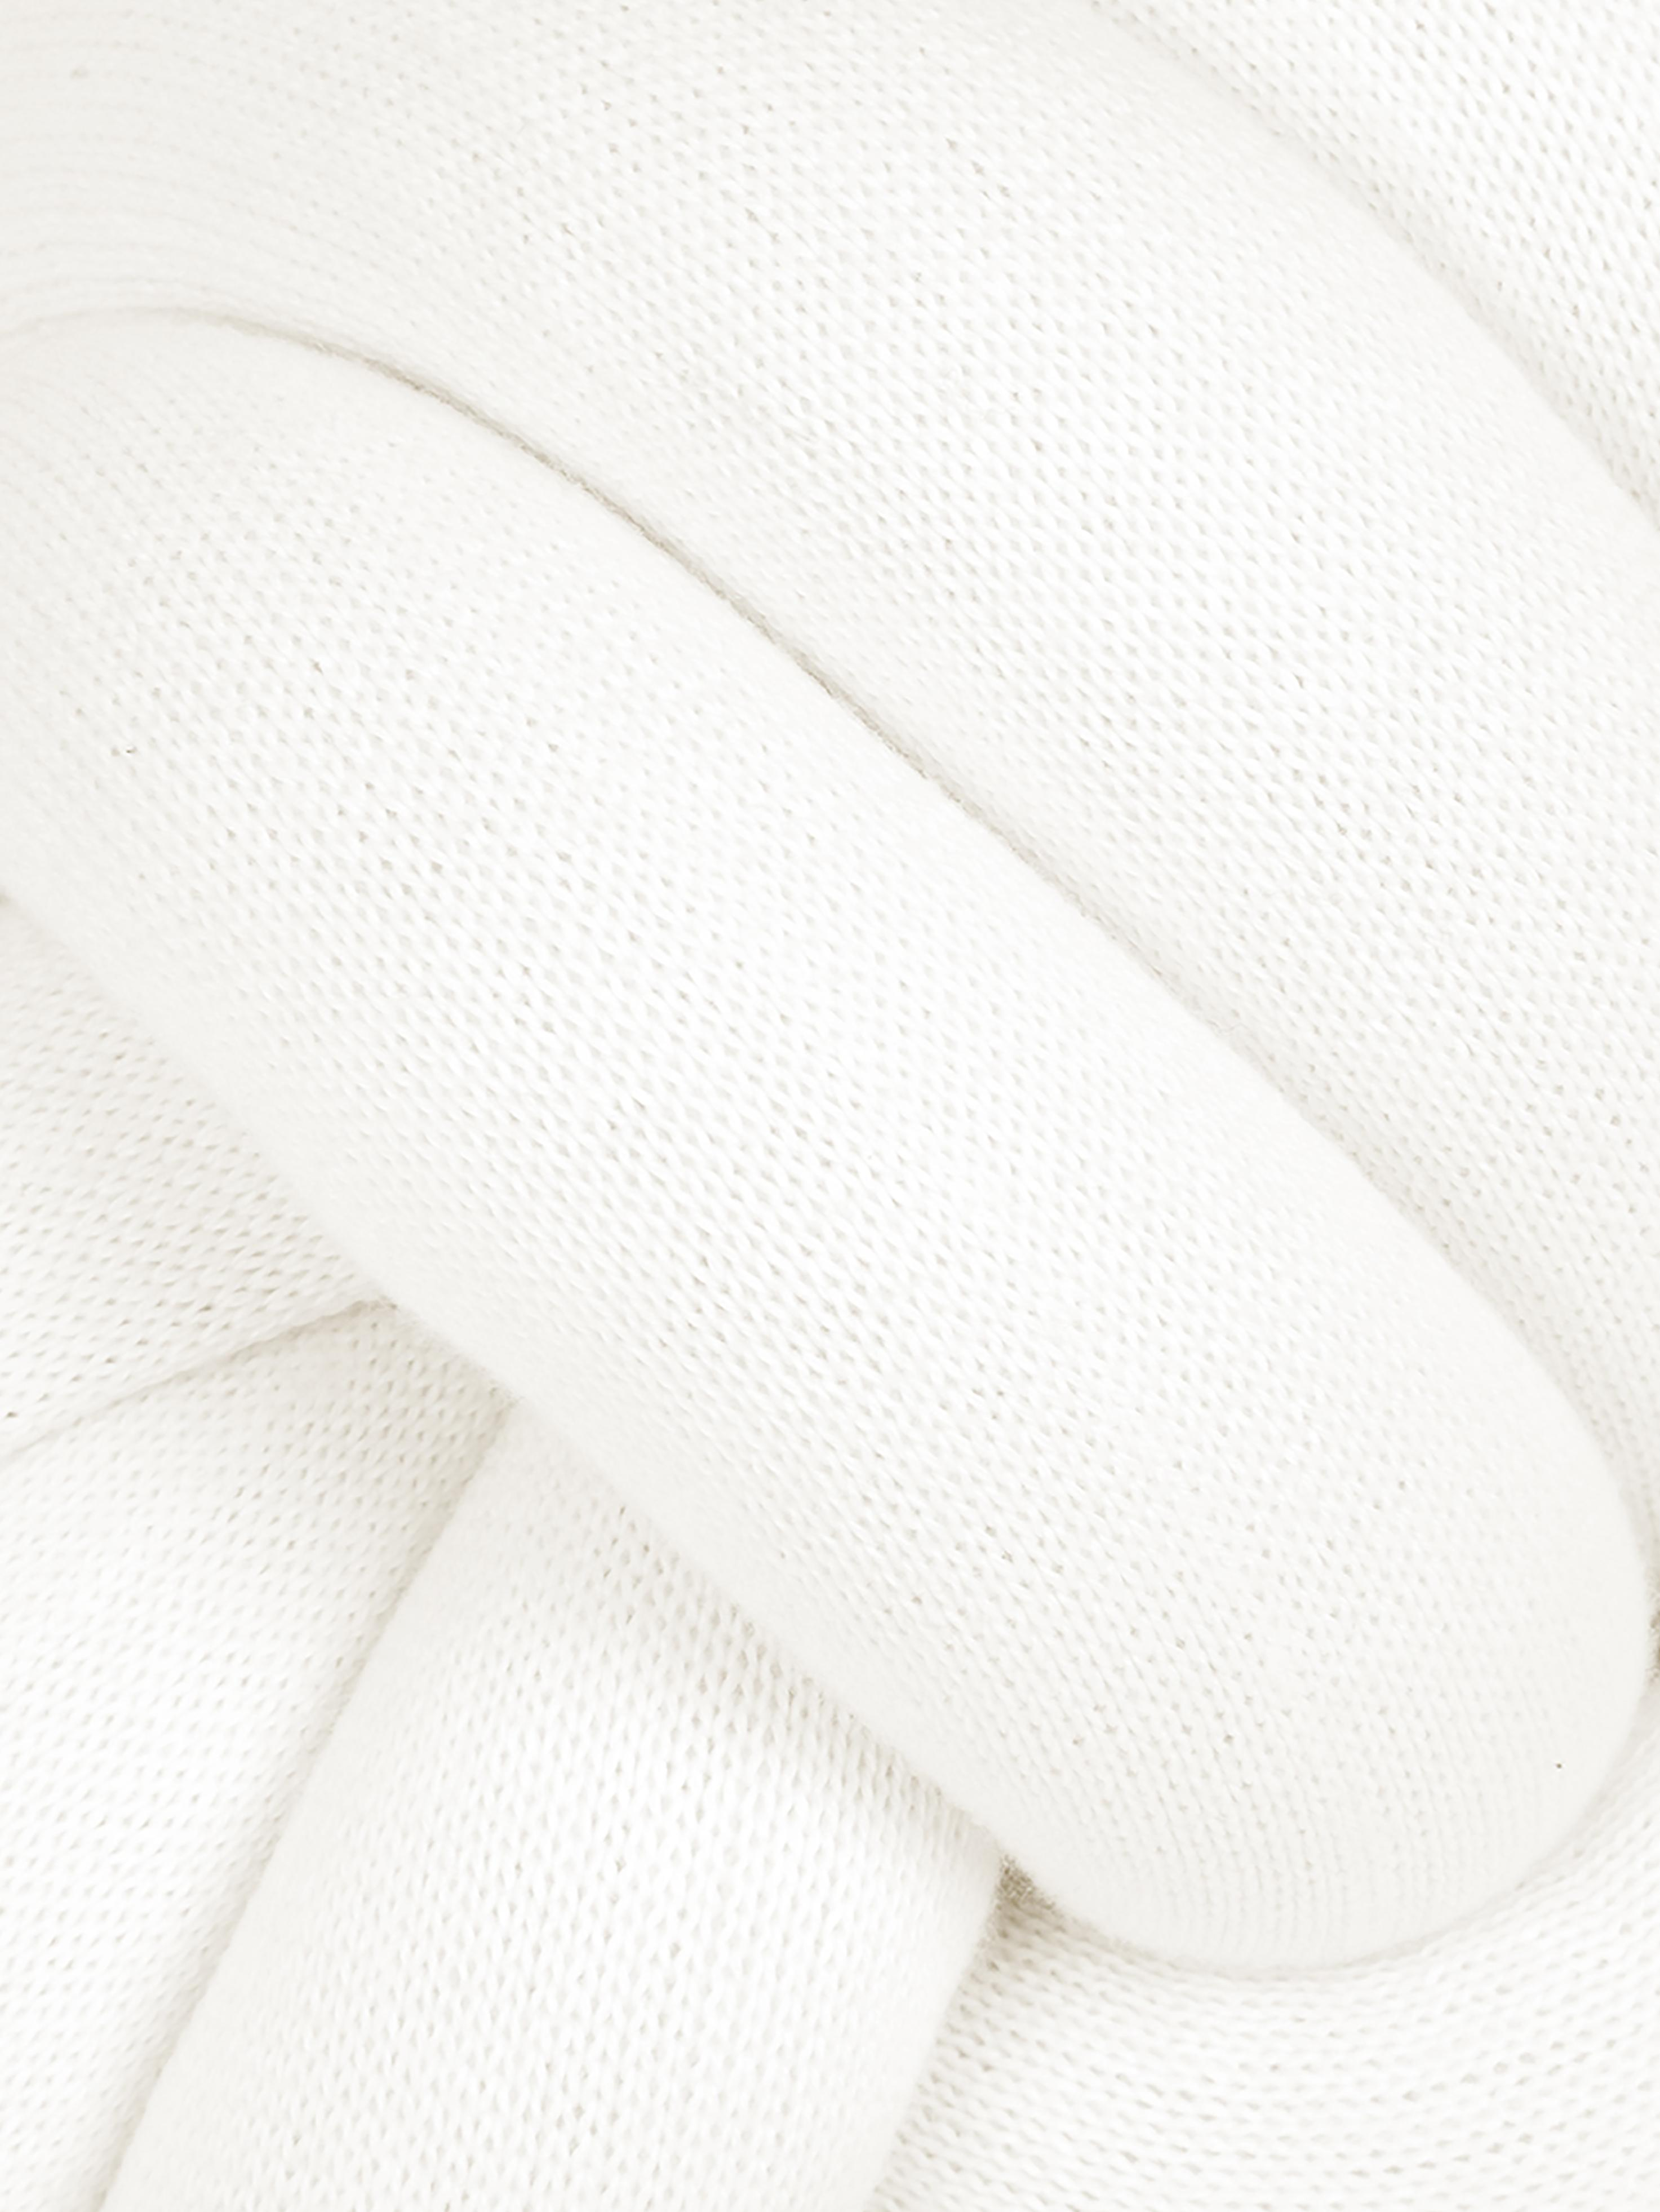 Cuscino bianco Twist, Bianco, Ø 30 cm